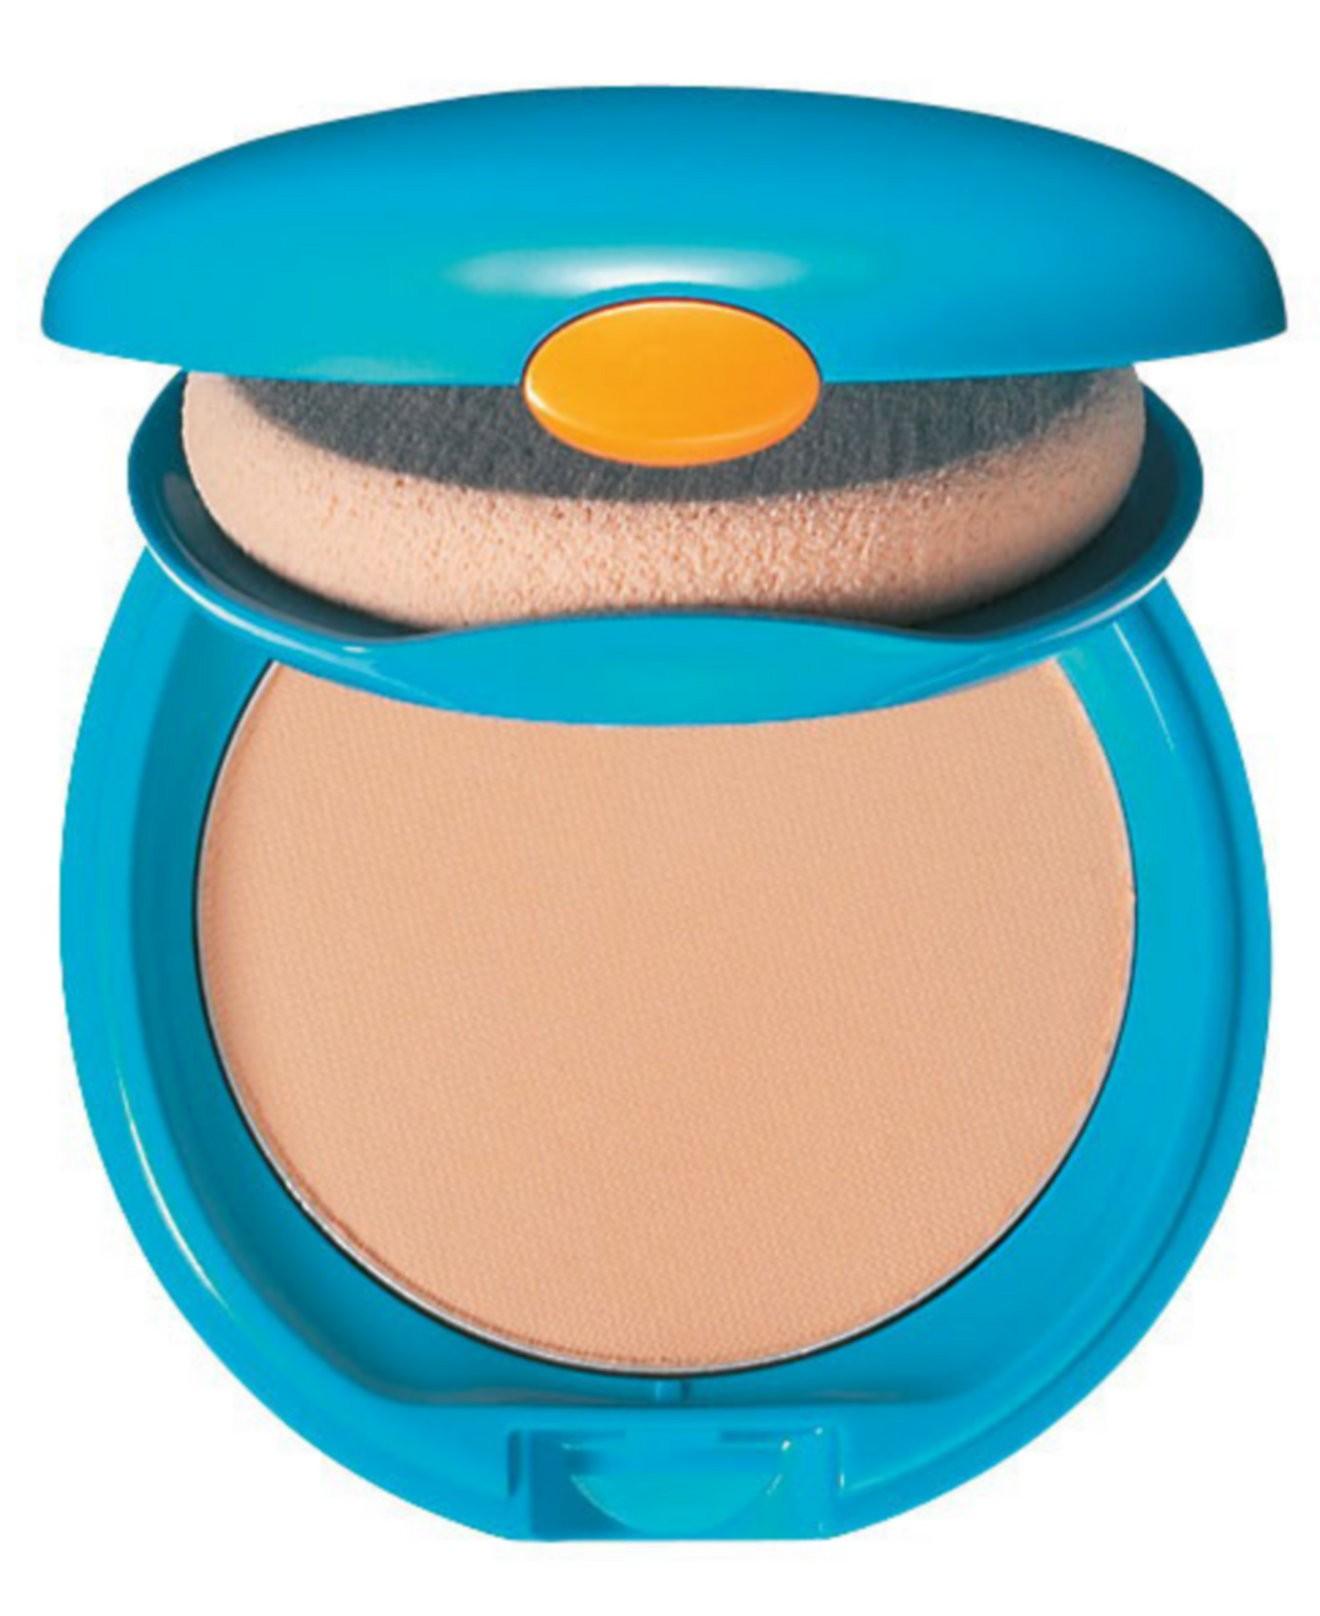 1562861282_shiseido-fond-de-teint-compact-protecteur-uv-spf30-jpg